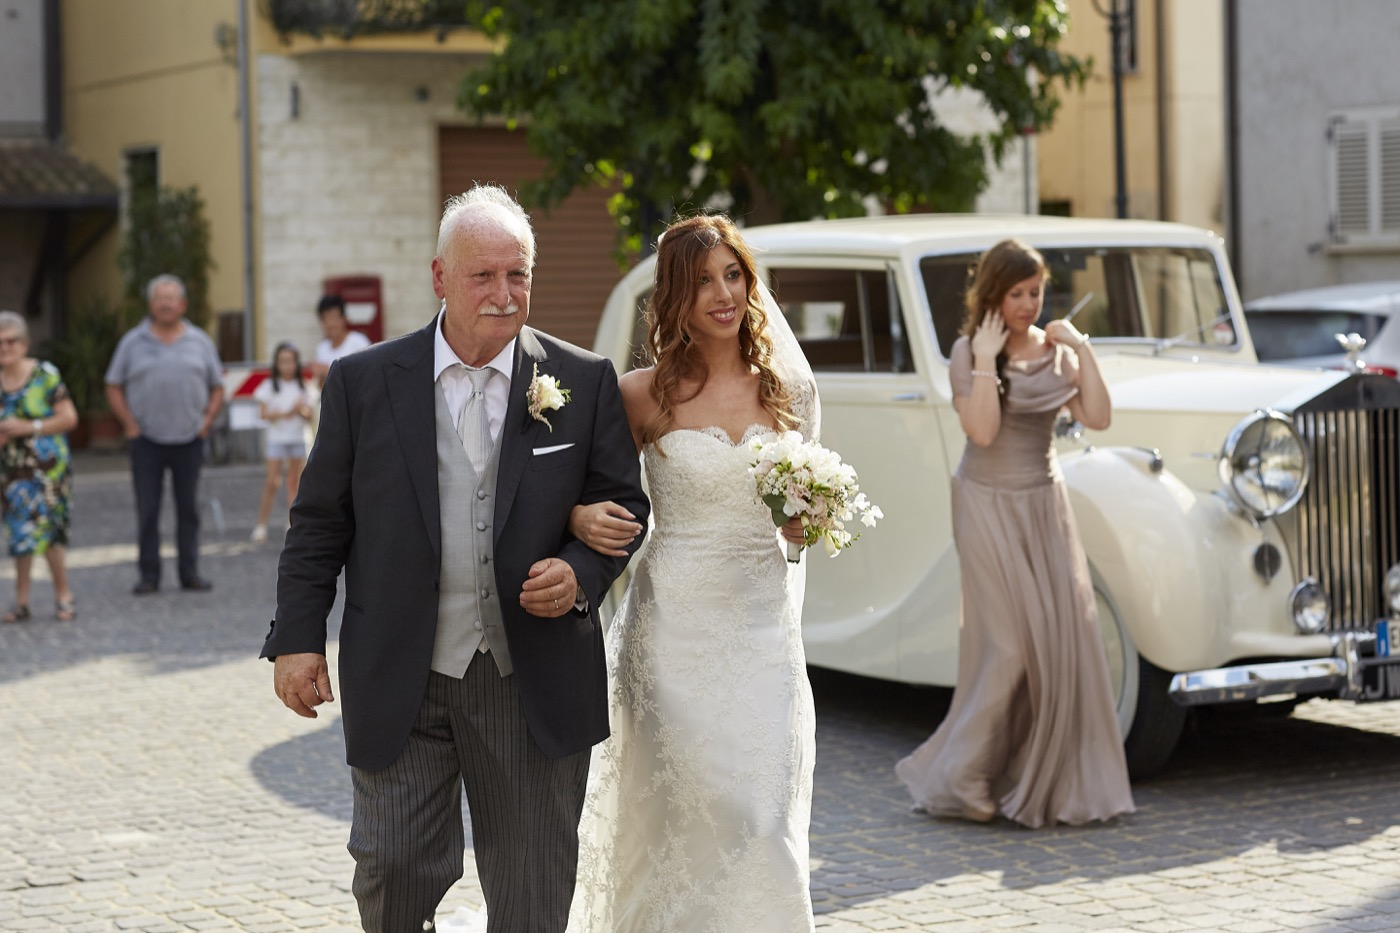 Claudio-Coppola-wedding-photographer-abbazia-7-frati-piegaro-41